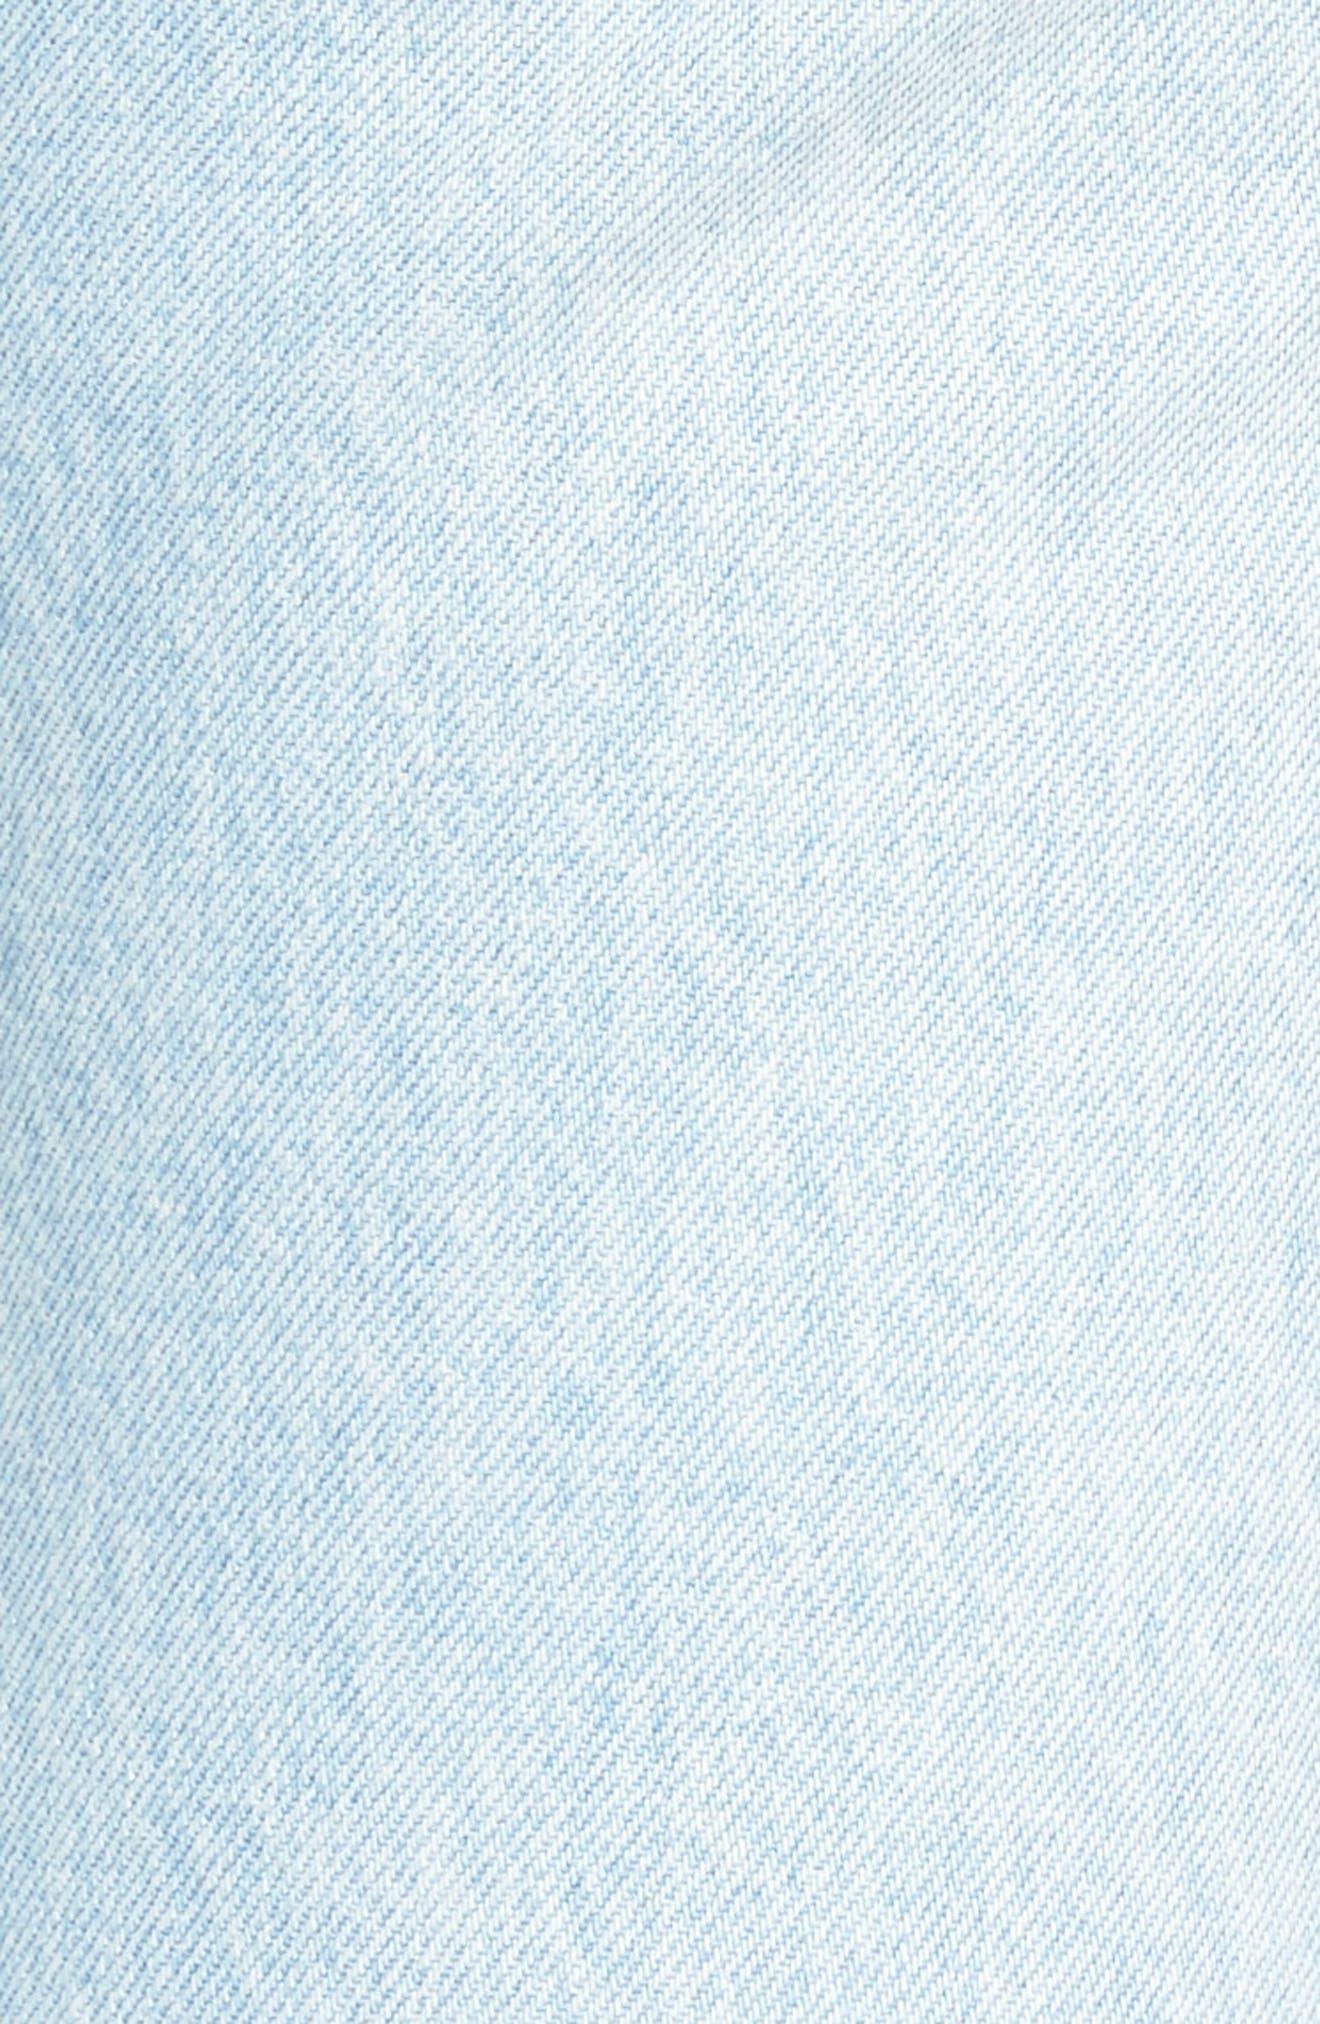 Twig II High Waist Ankle Slim Jeans,                             Alternate thumbnail 7, color,                             Pipeline Blue